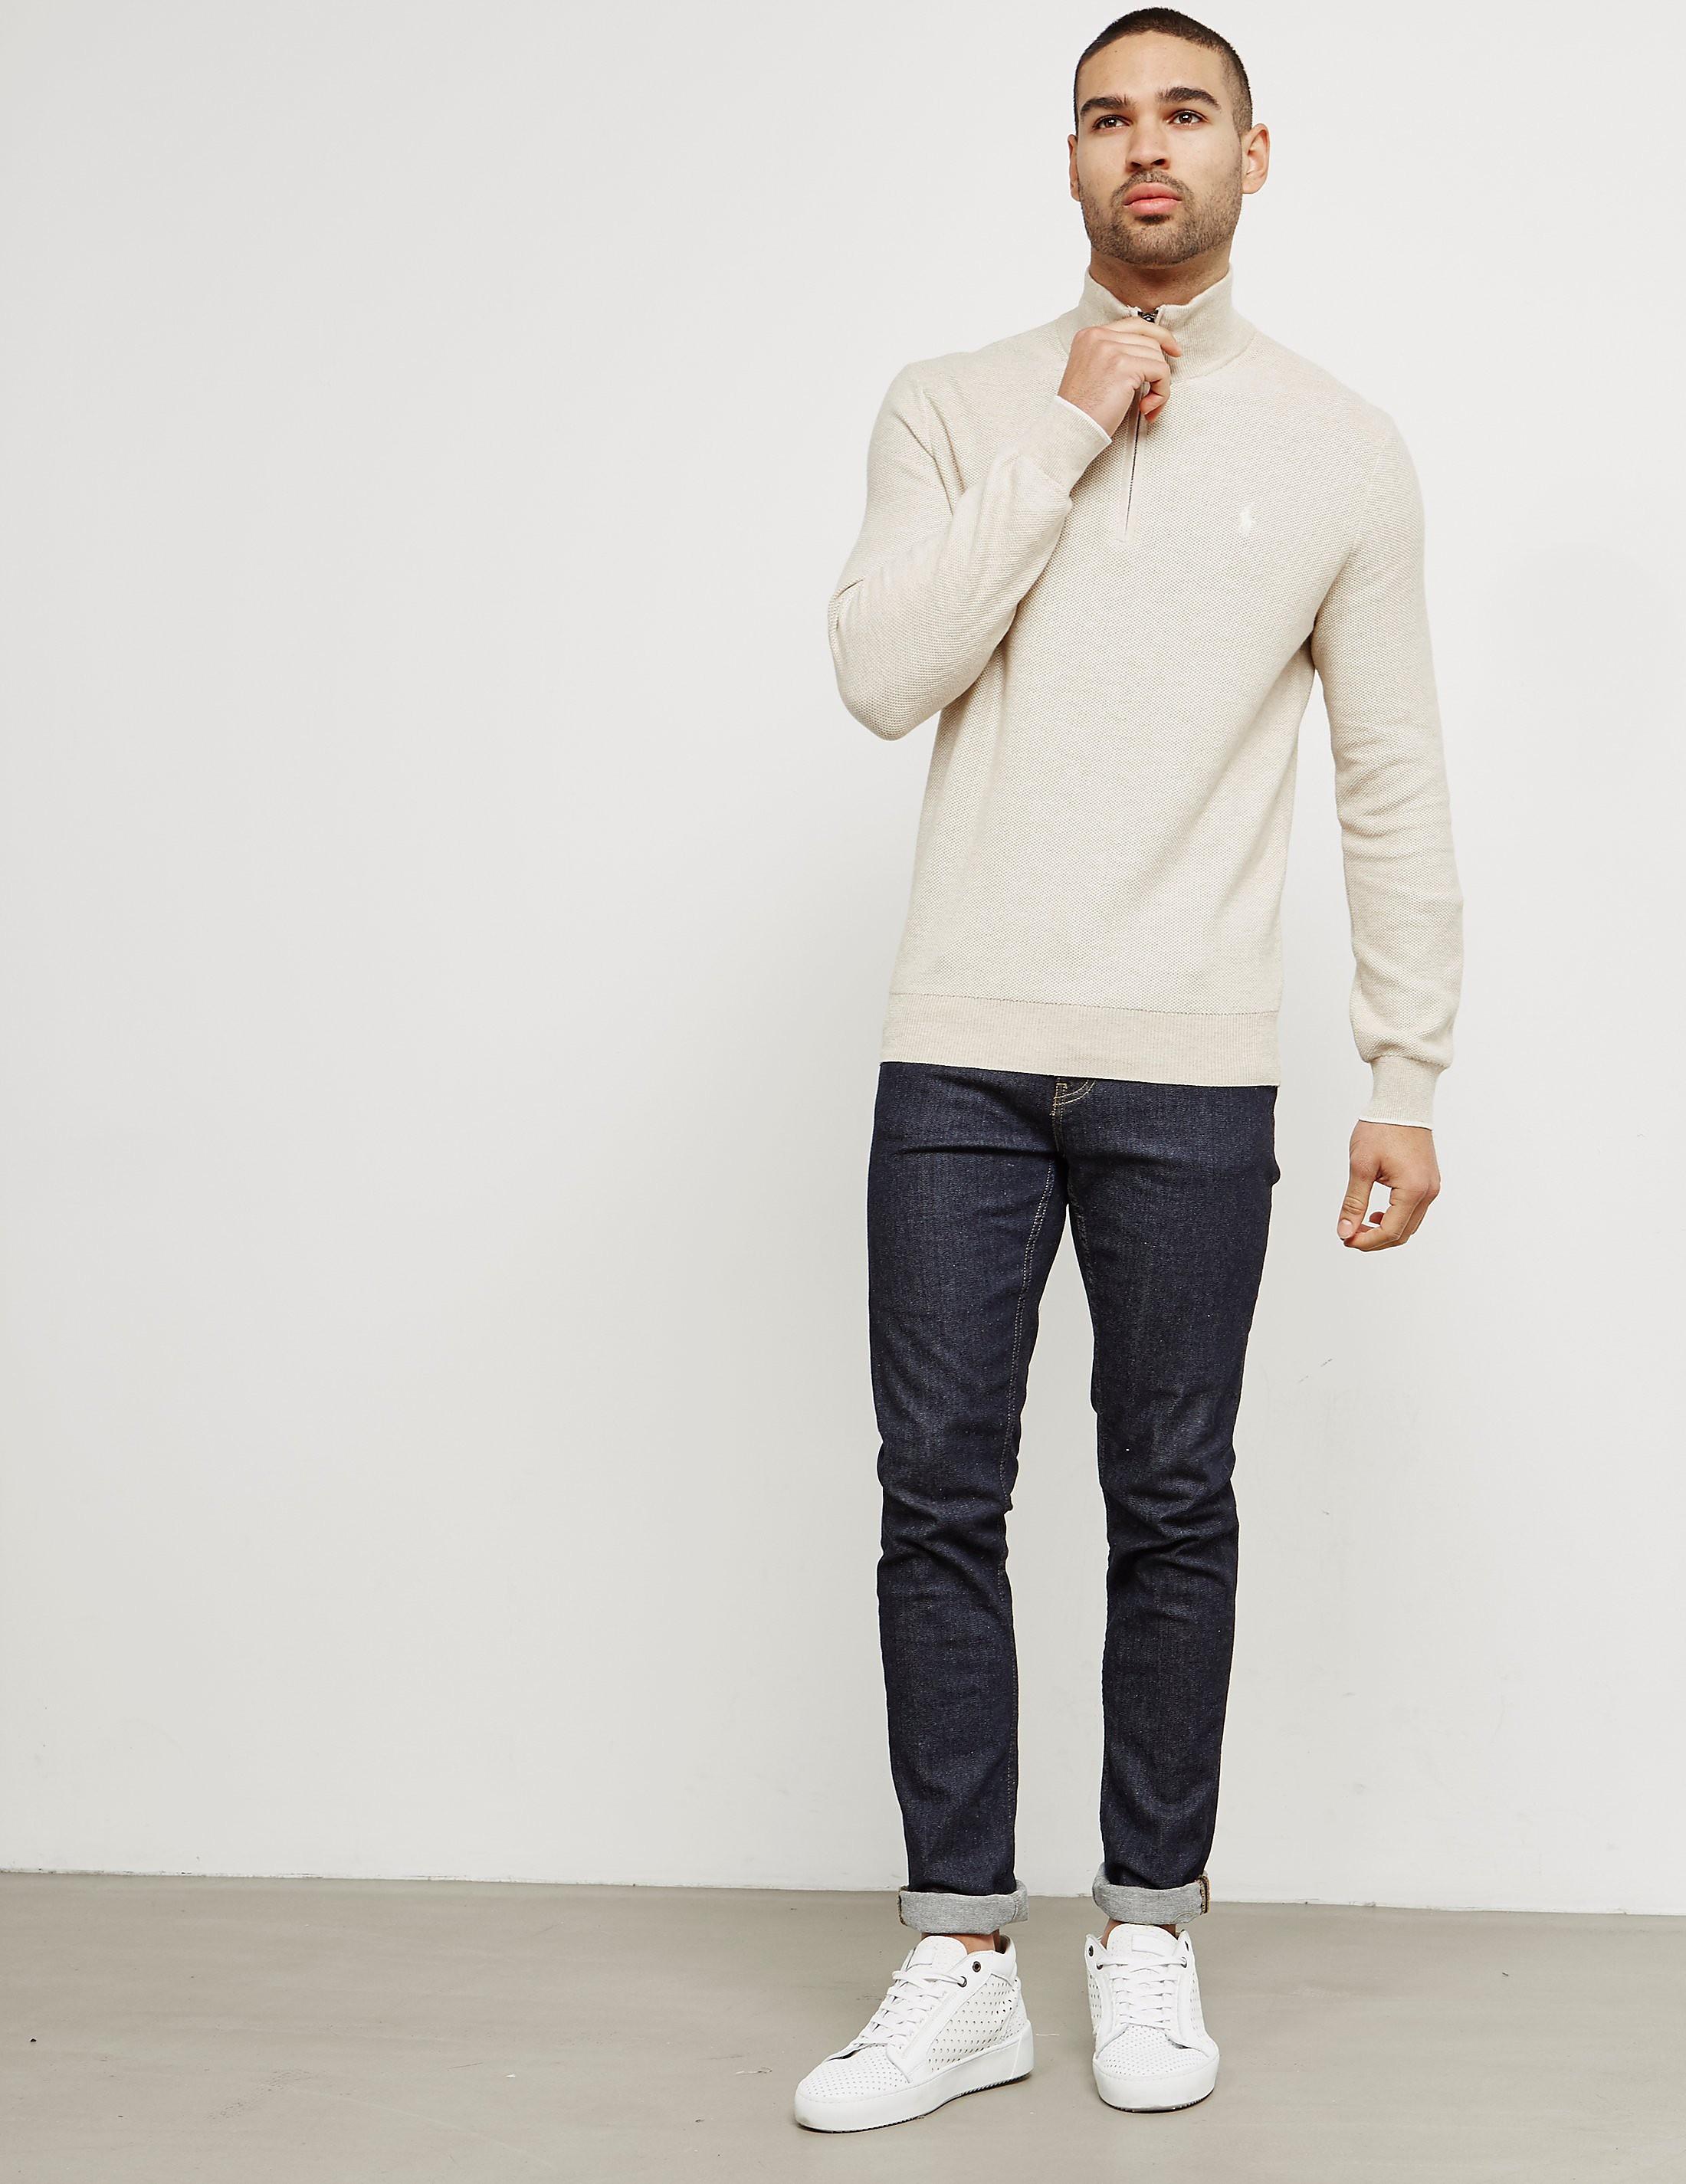 Polo Ralph Lauren Pima Half-Zip Knitted Jumper